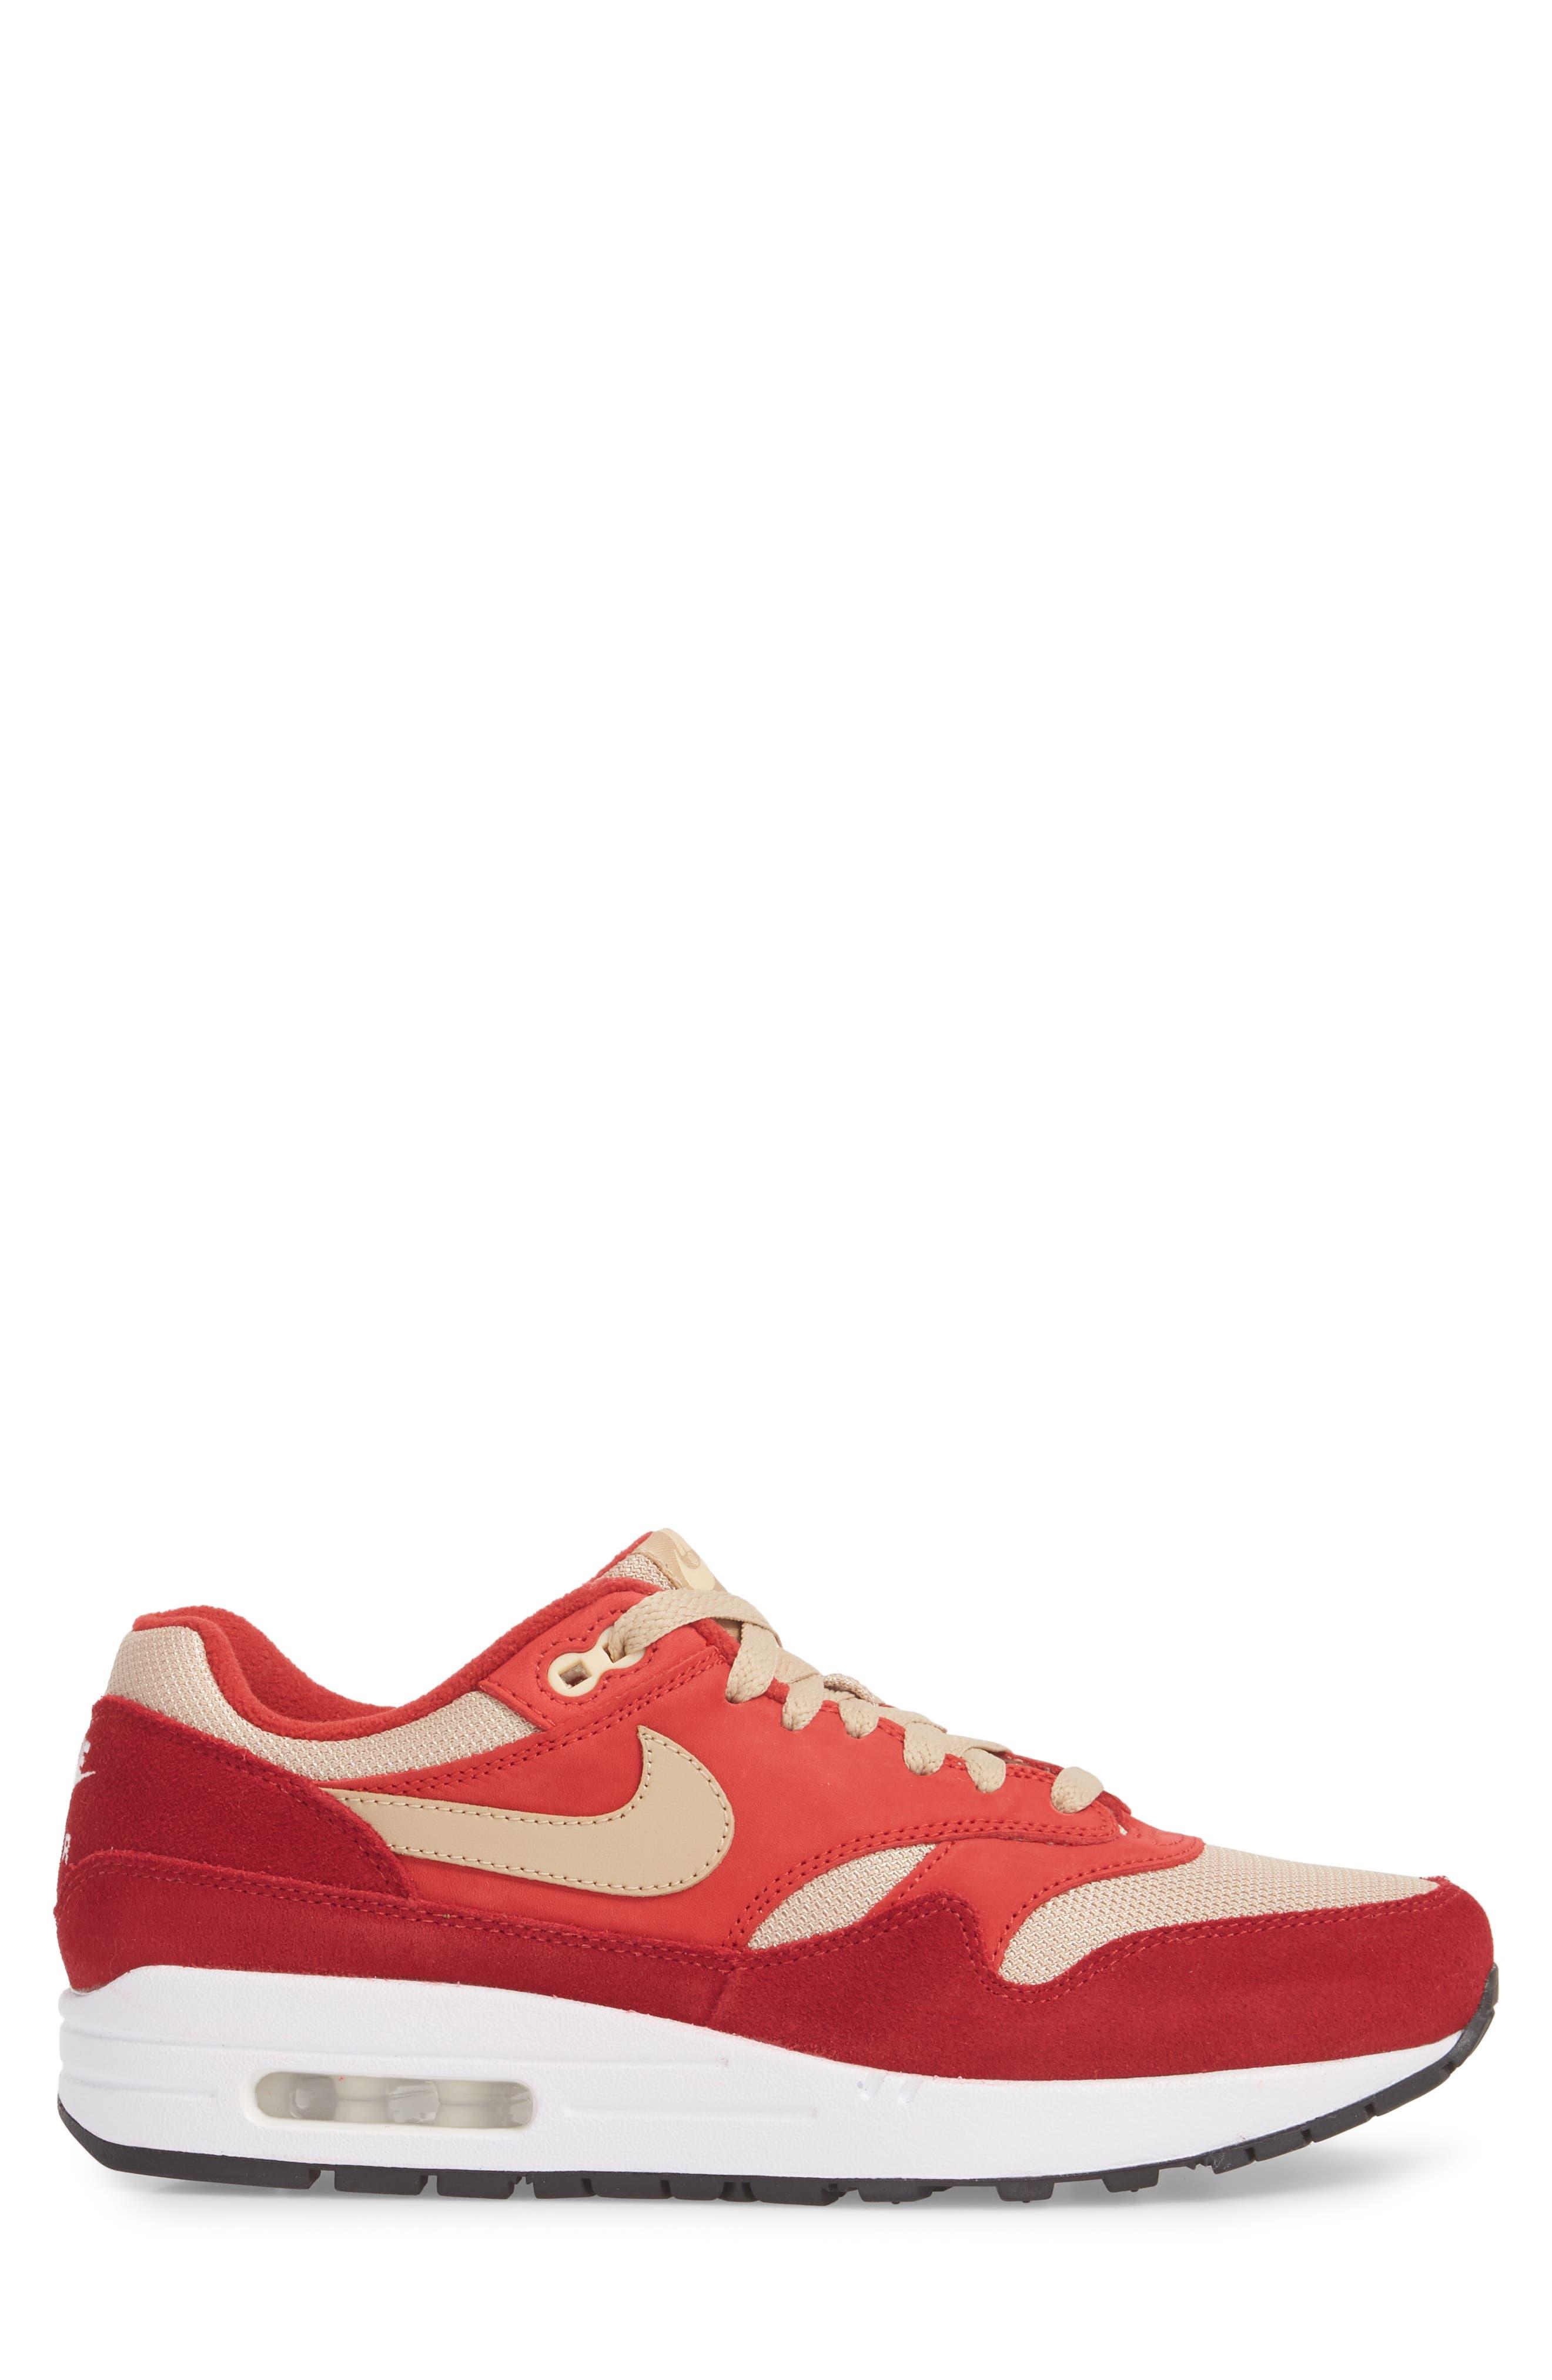 Air Max 1 Premium Retro Sneaker,                             Alternate thumbnail 6, color,